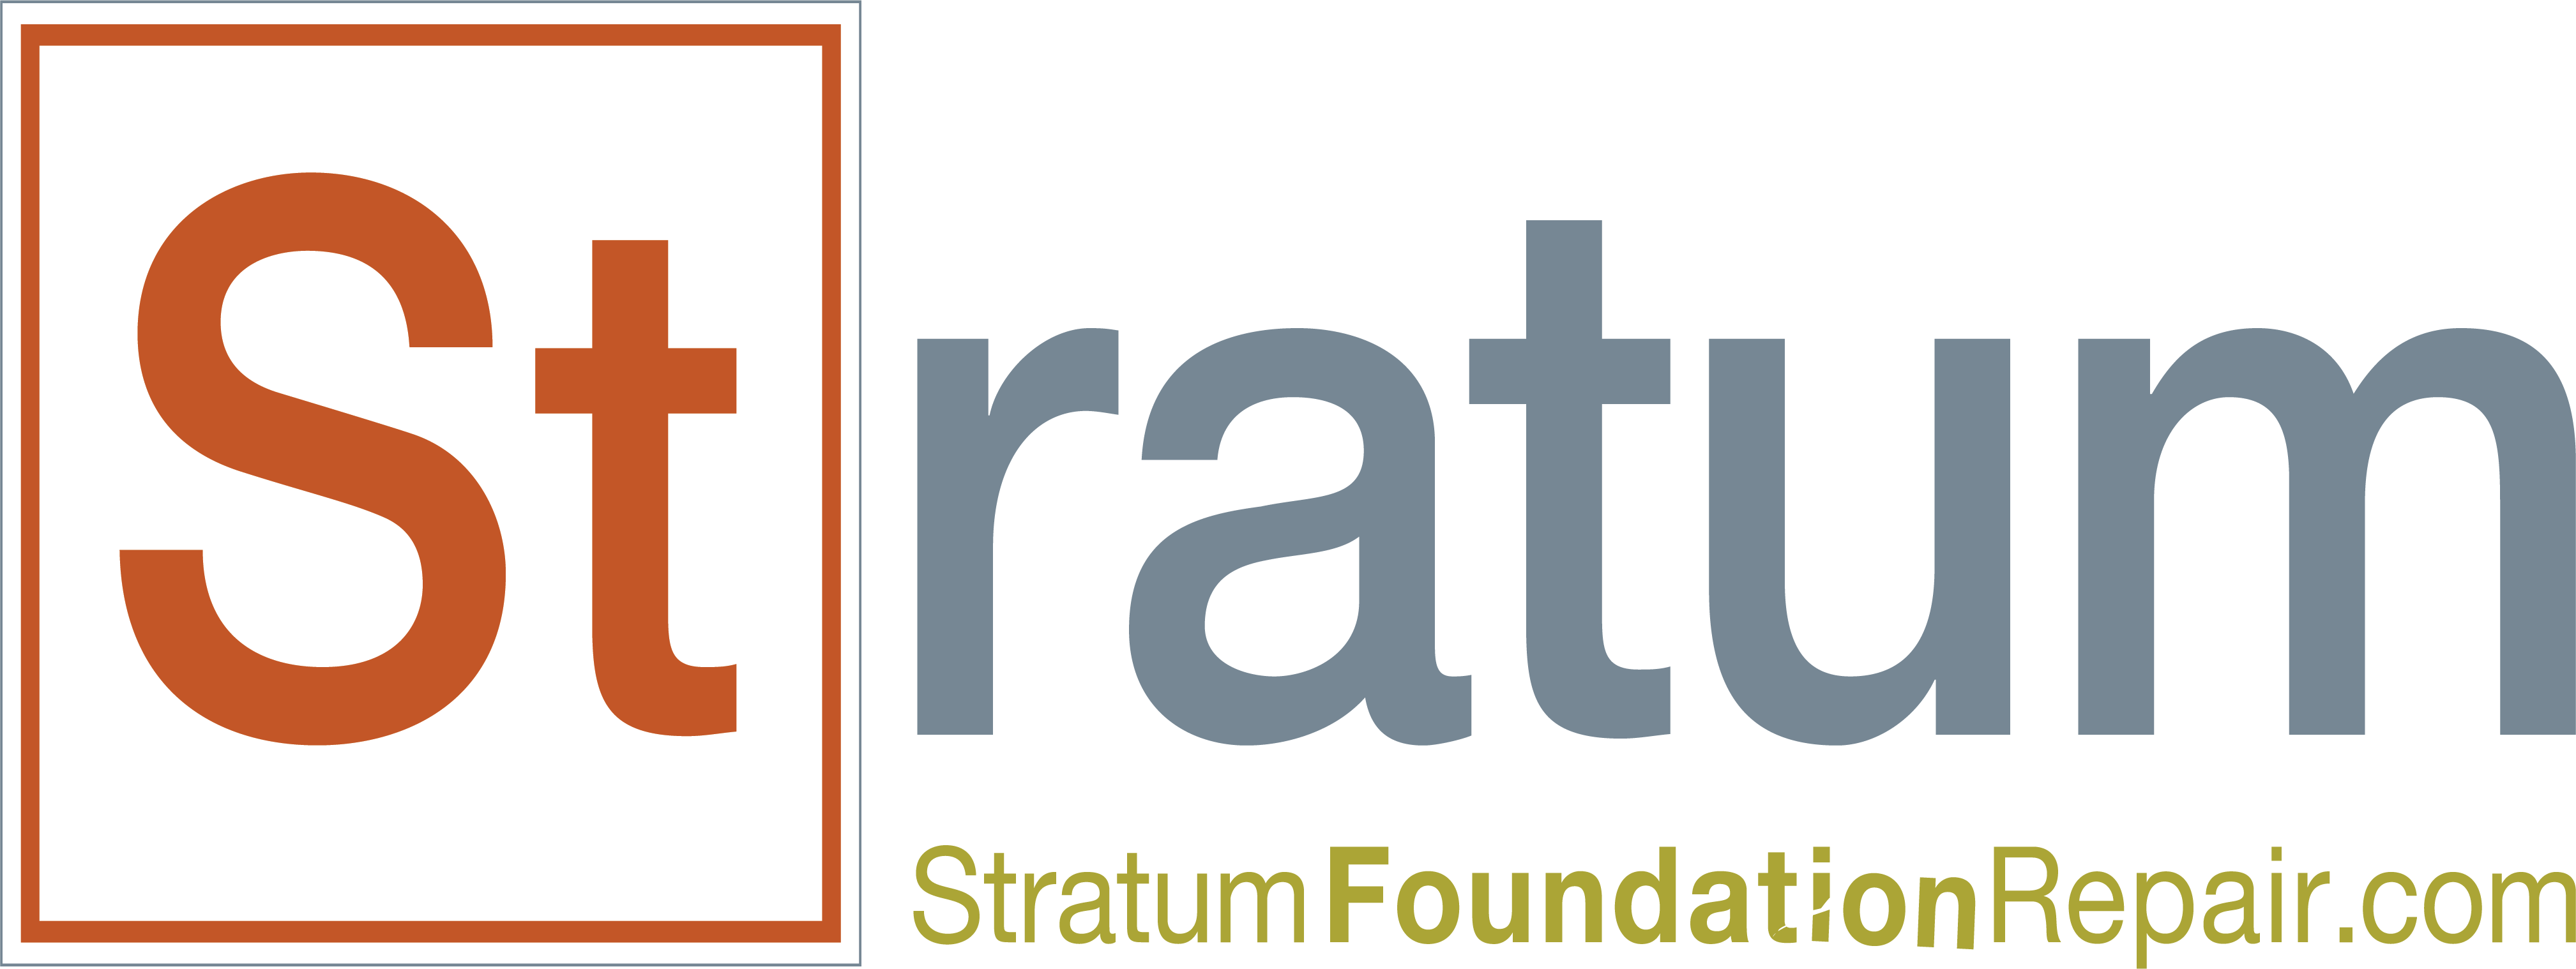 Stratum Foundation Repair reviews | Construction at 101 E Park Blvd STE 600 - Plano TX